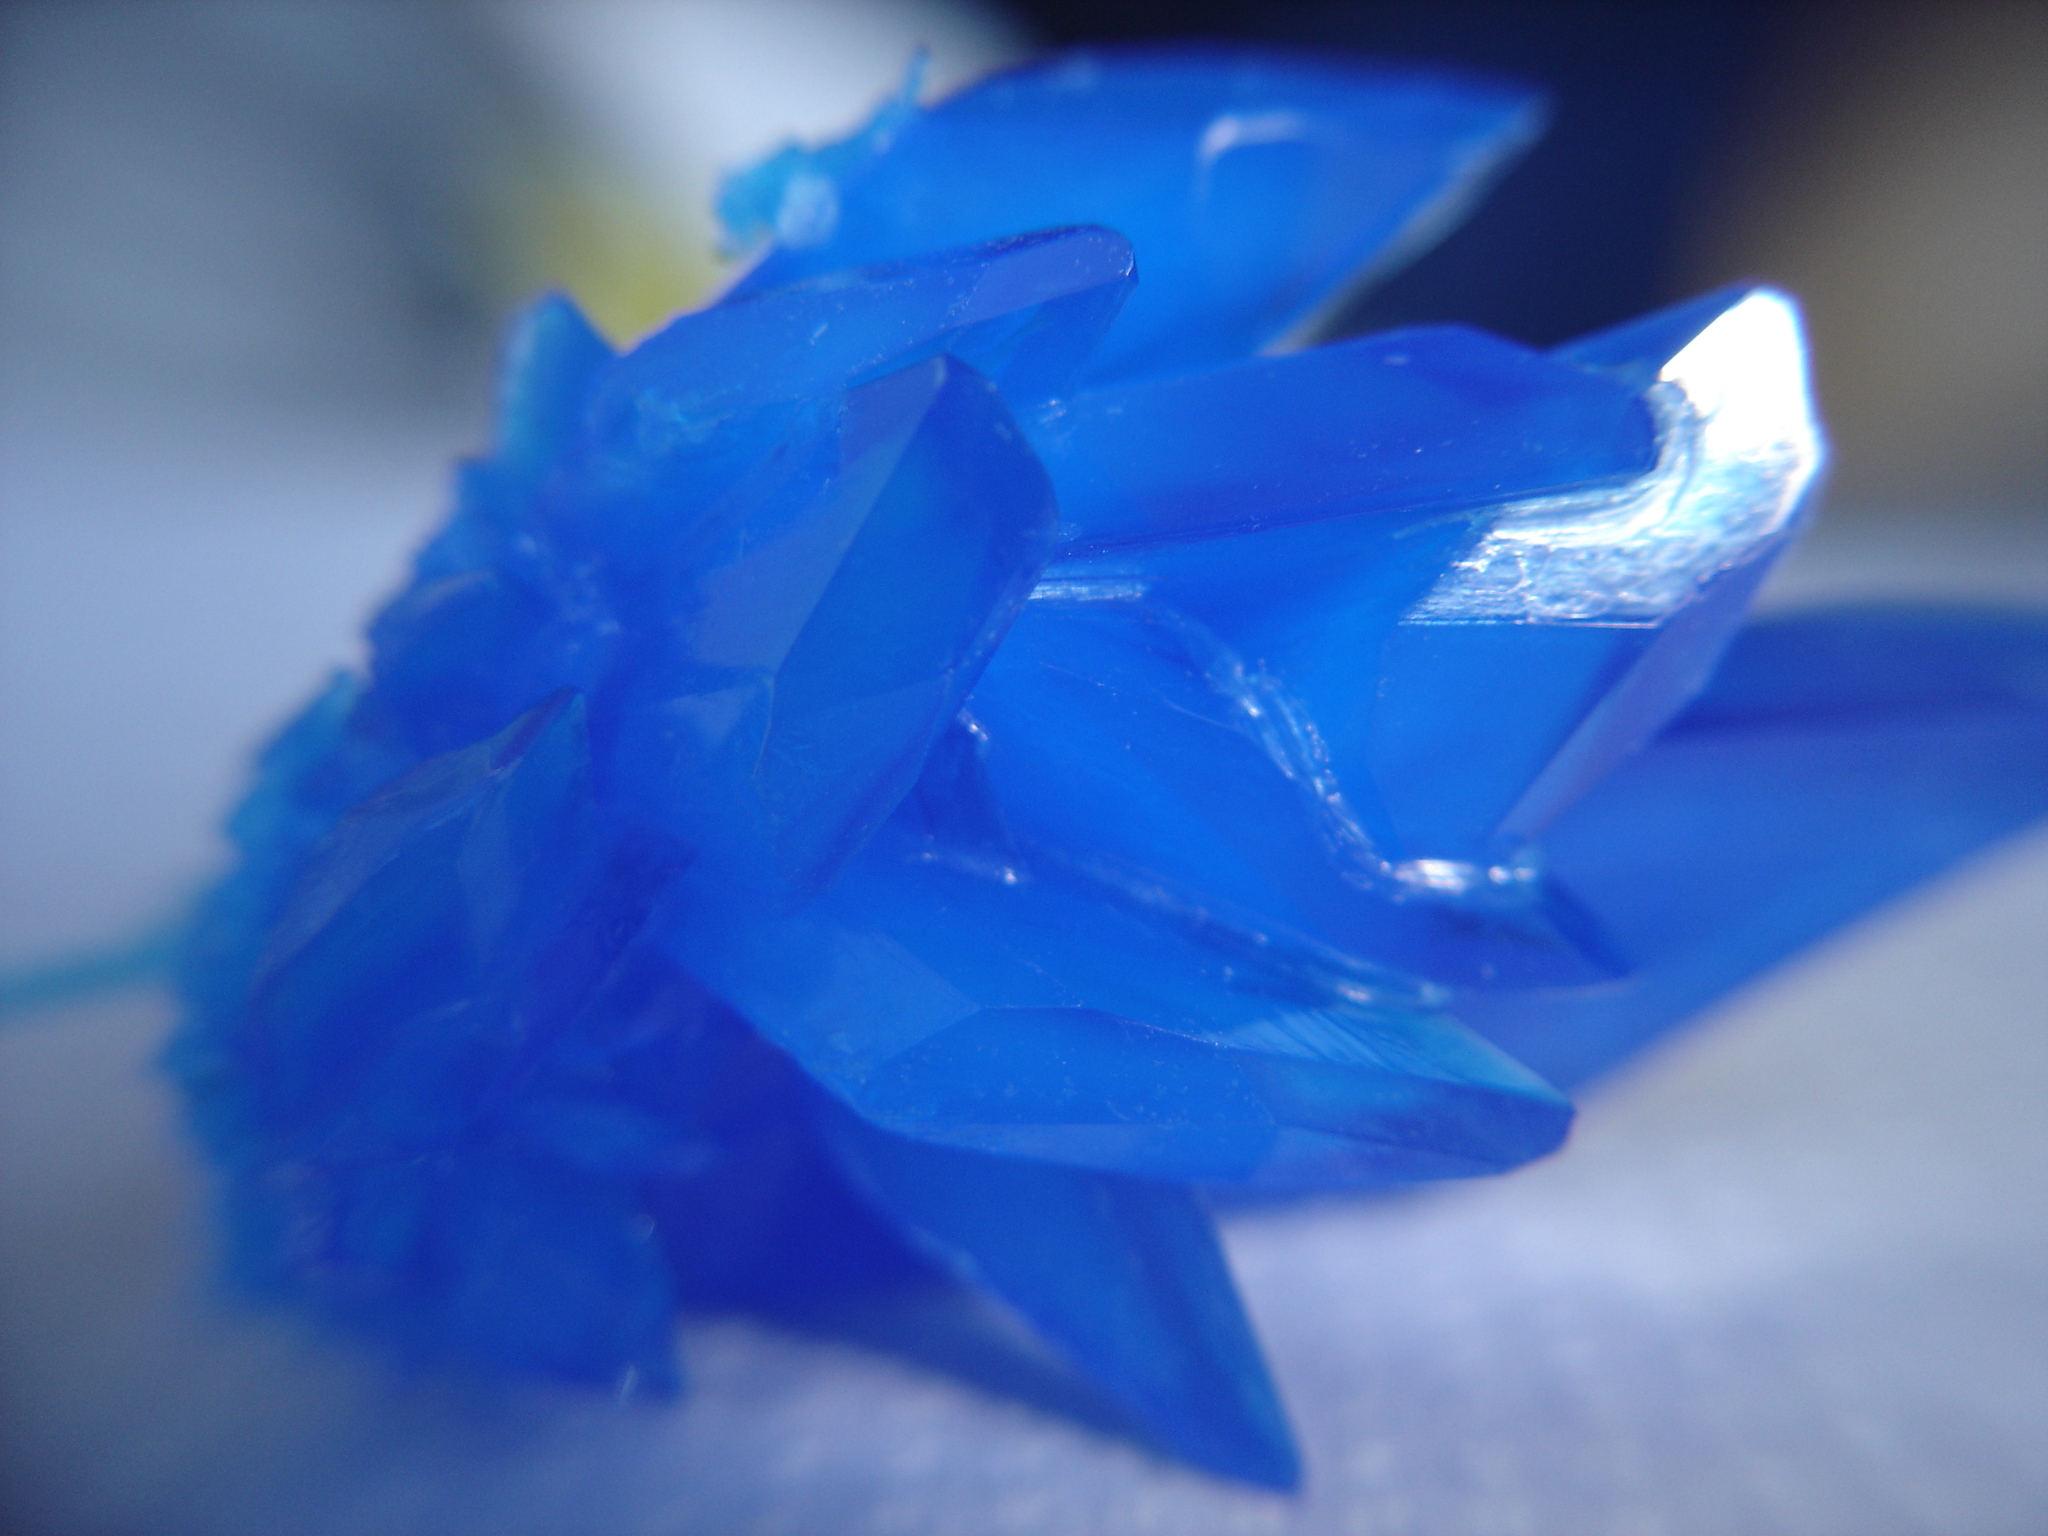 Cristales de sulfato de cobre